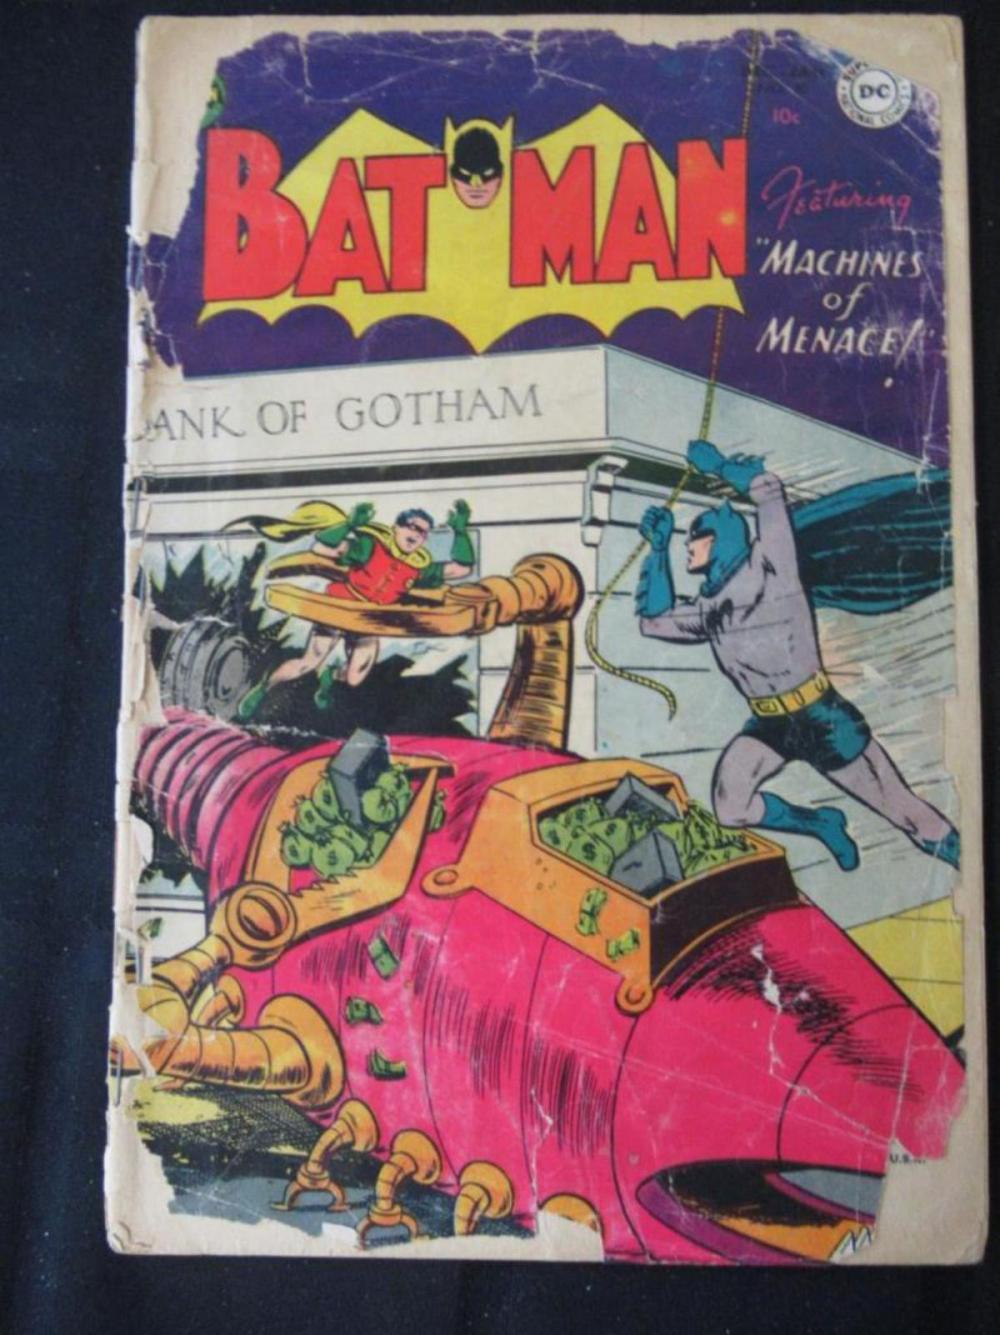 Batman 10c #80 Machines of Menace